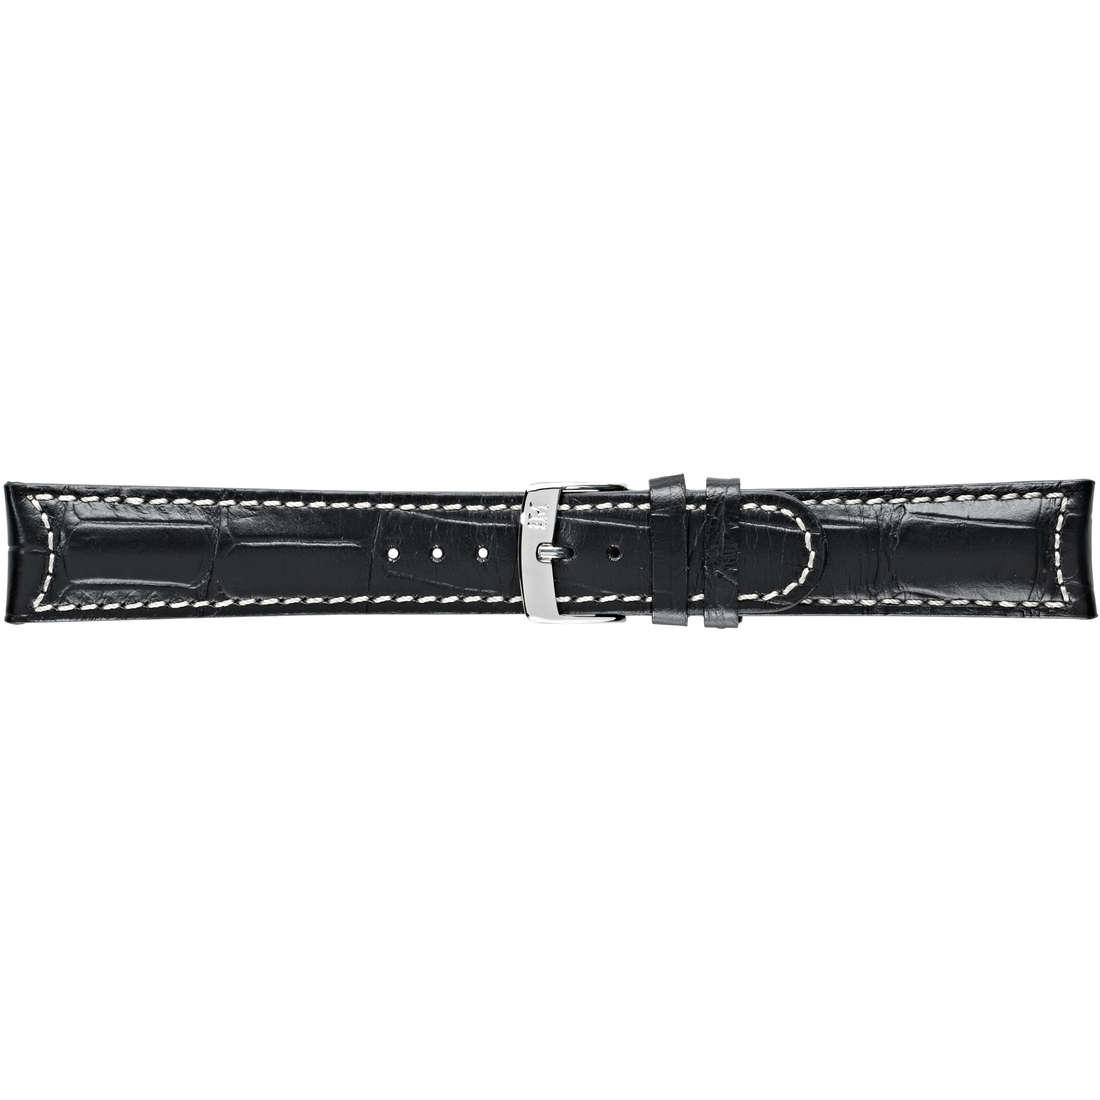 watch watch bands watch straps man Morellato Manufatti A01U3882A59019CR24